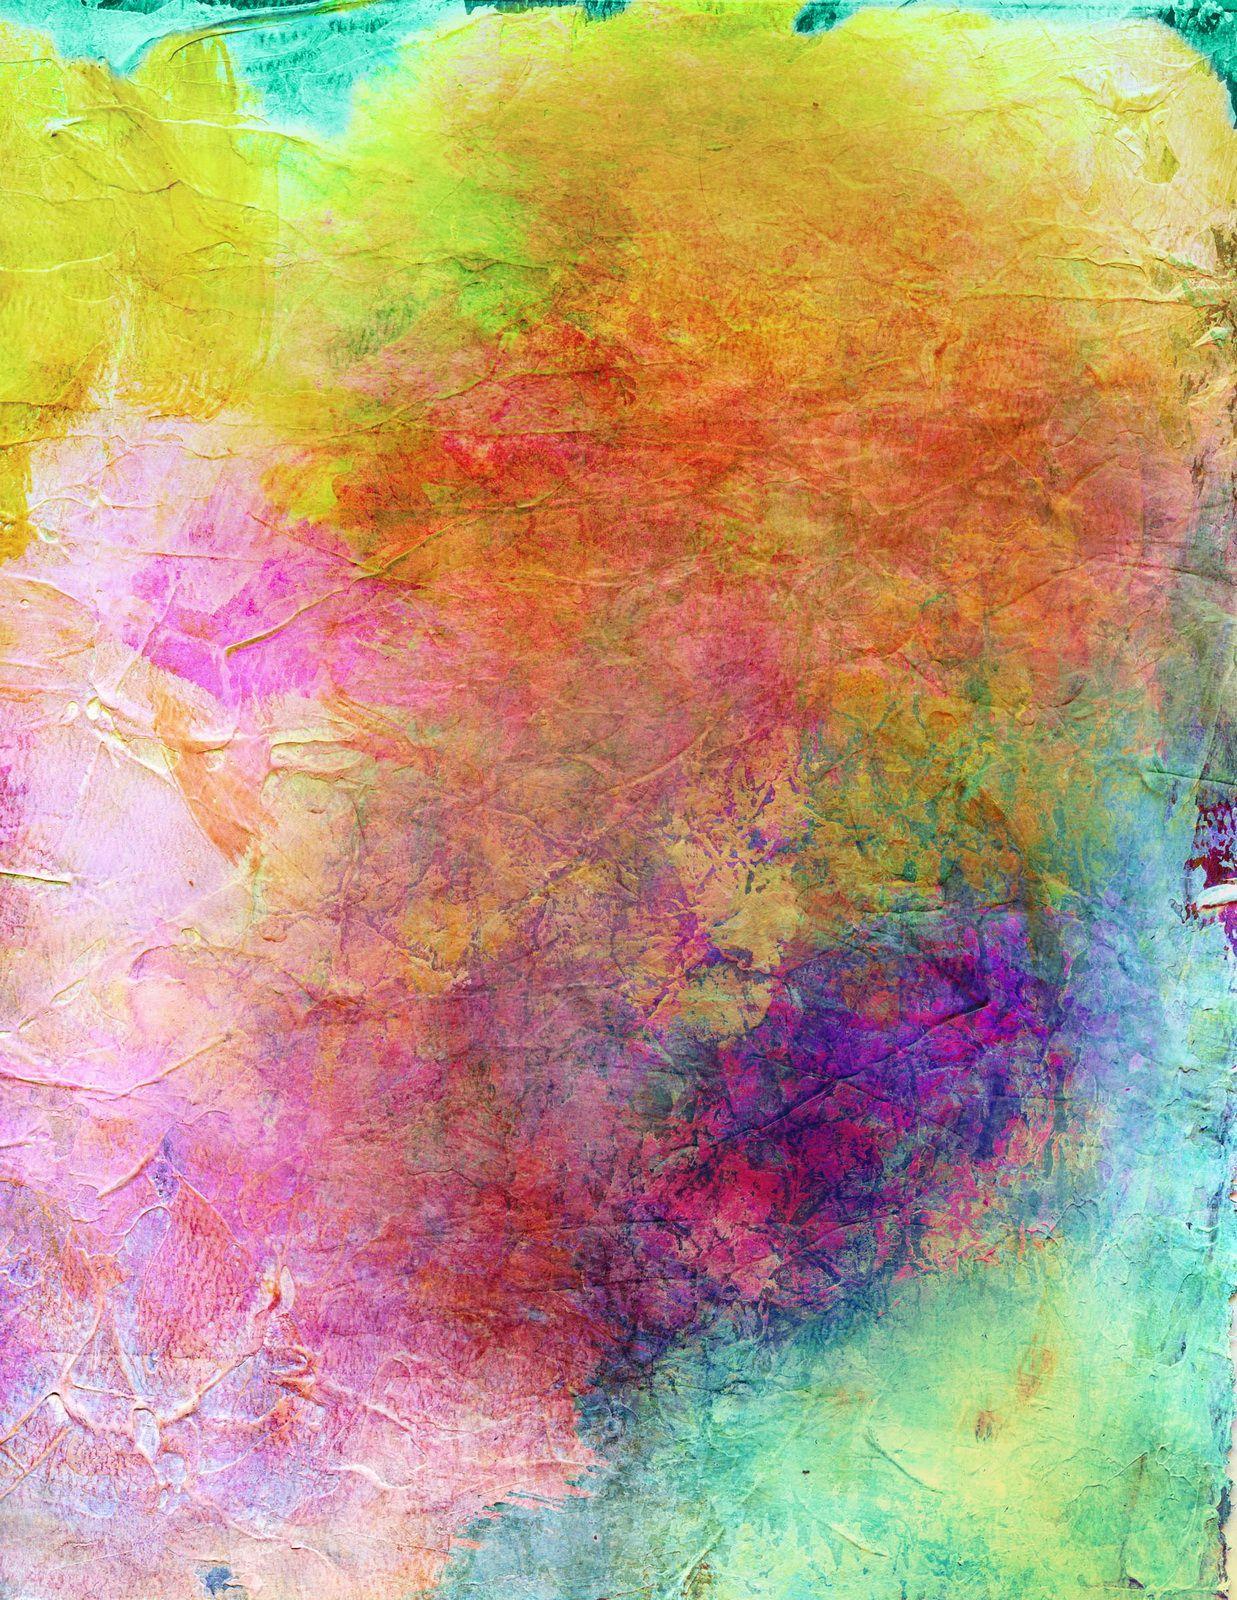 tissue paper texture | art projects | Pinterest | Tissue ...